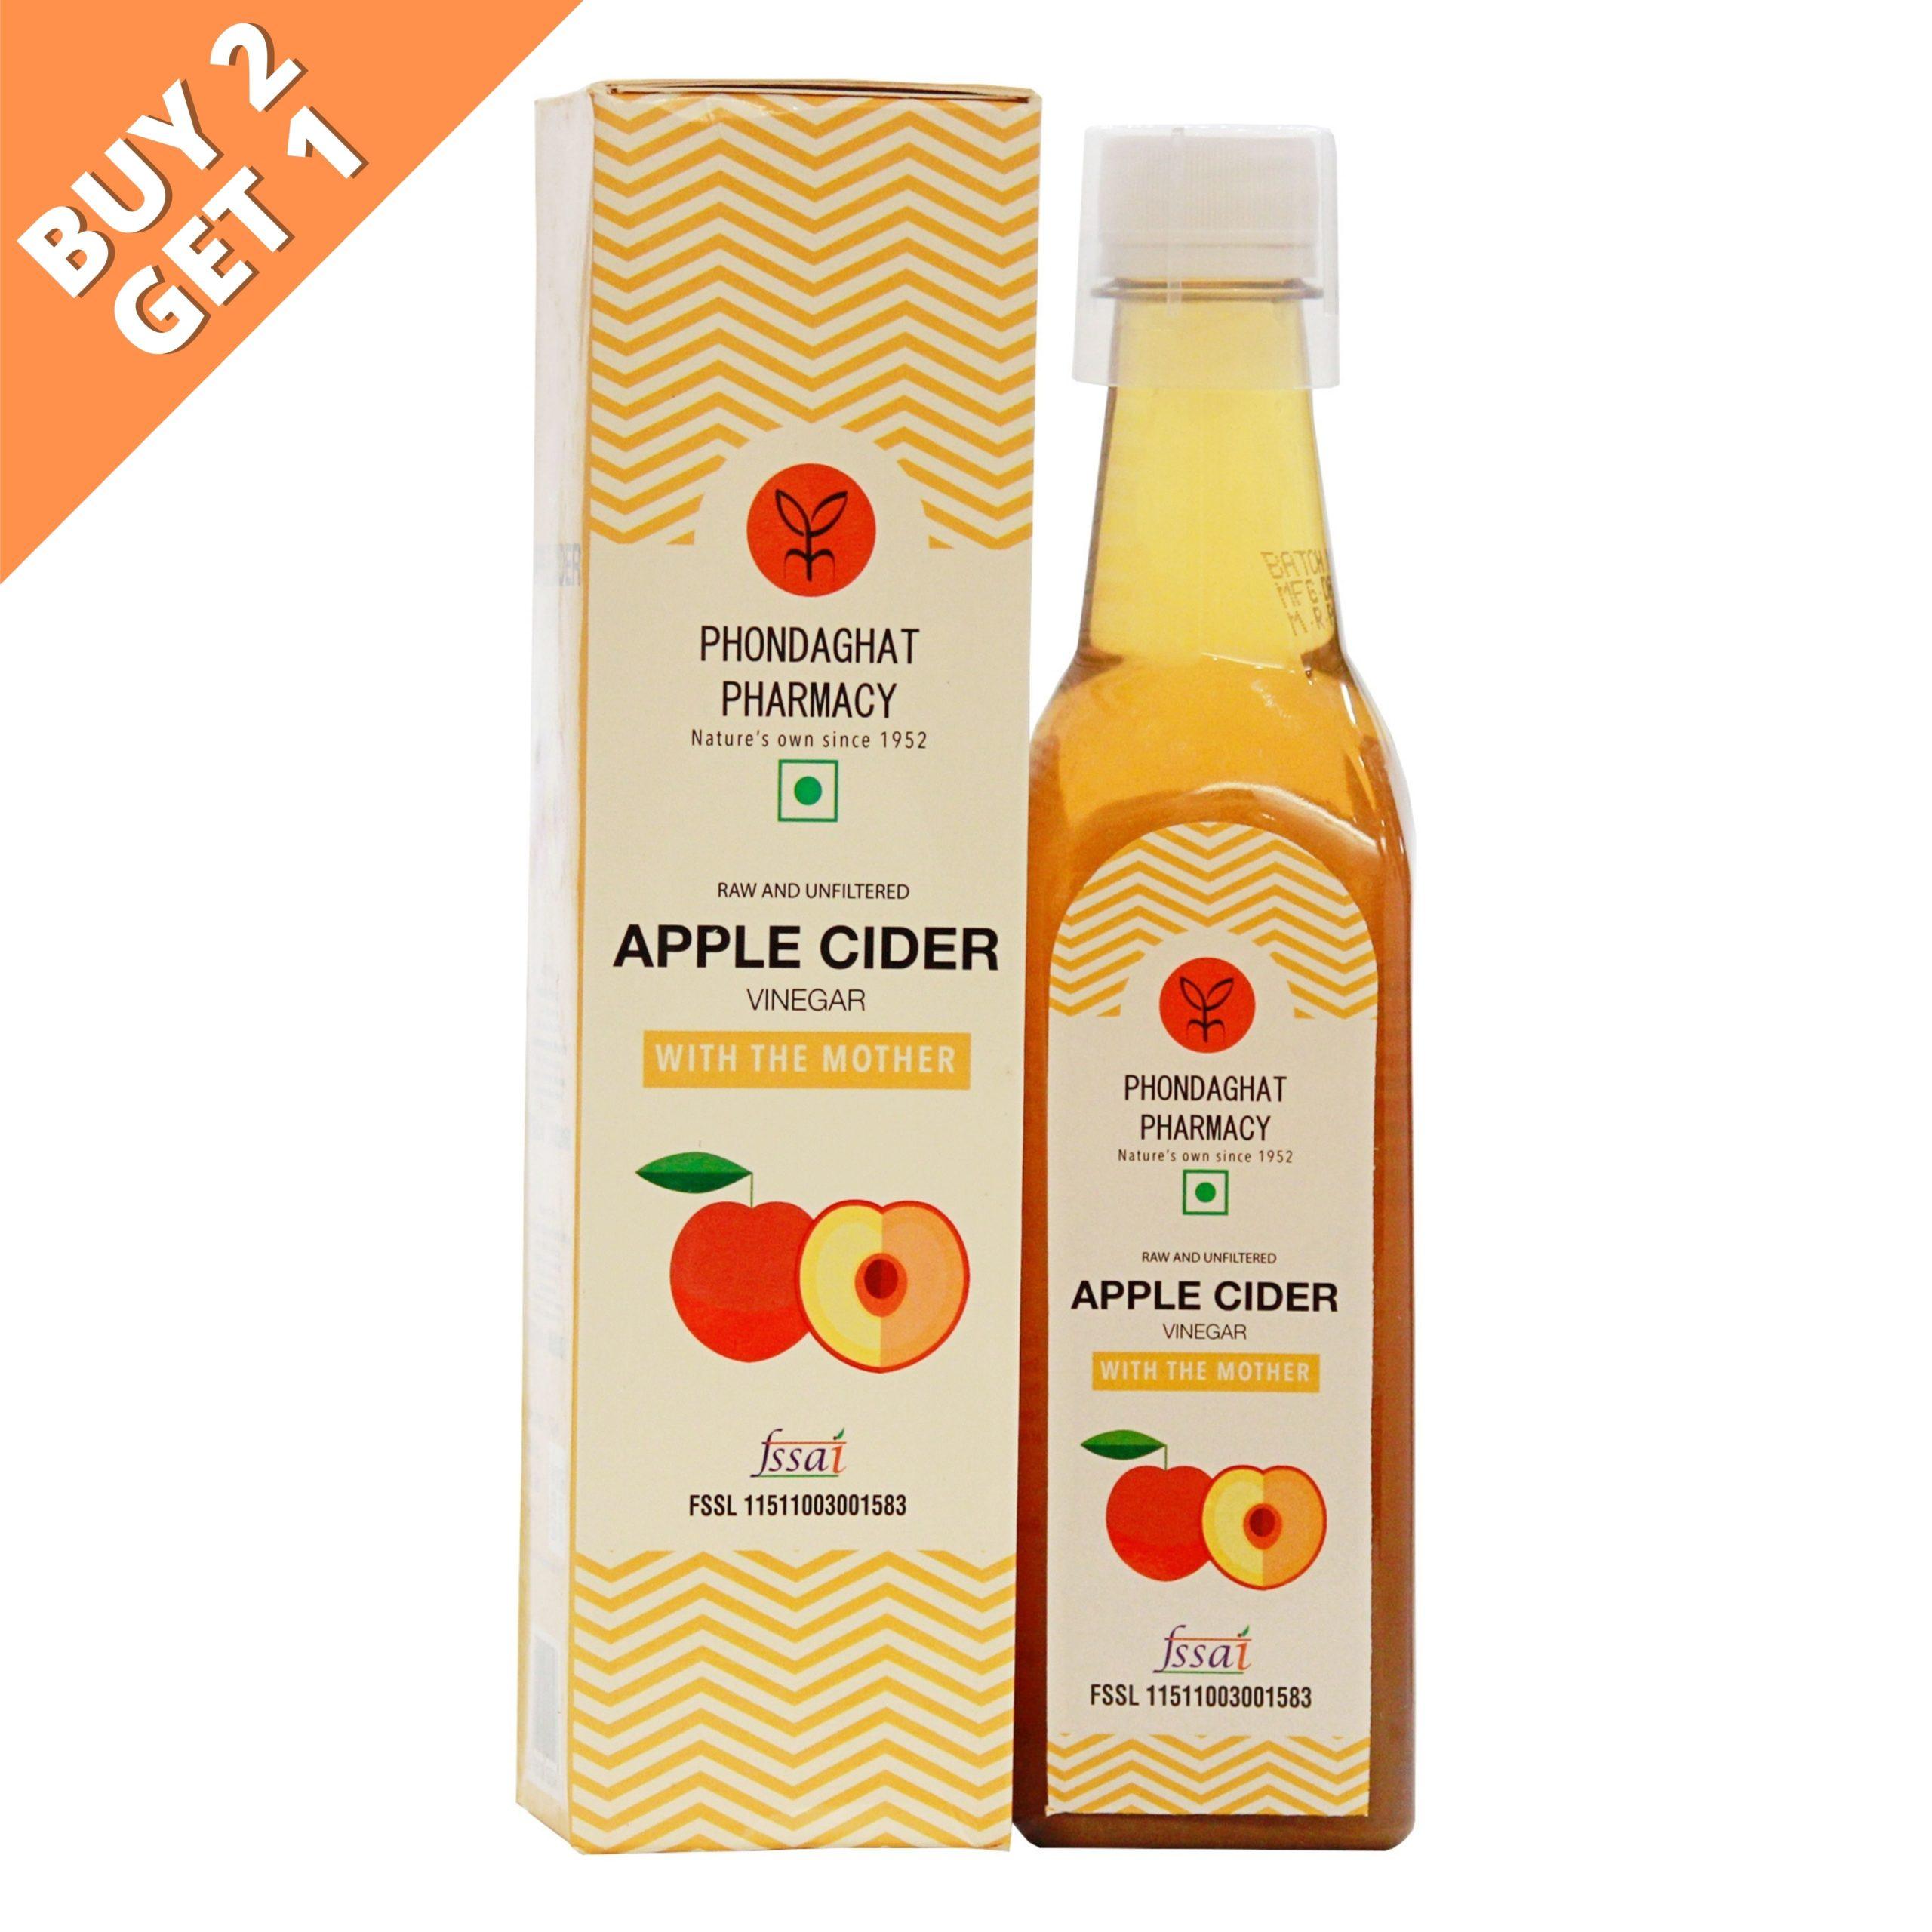 Organic Apple Cider Vinegar With Mother Buy 2 Get 1 Free